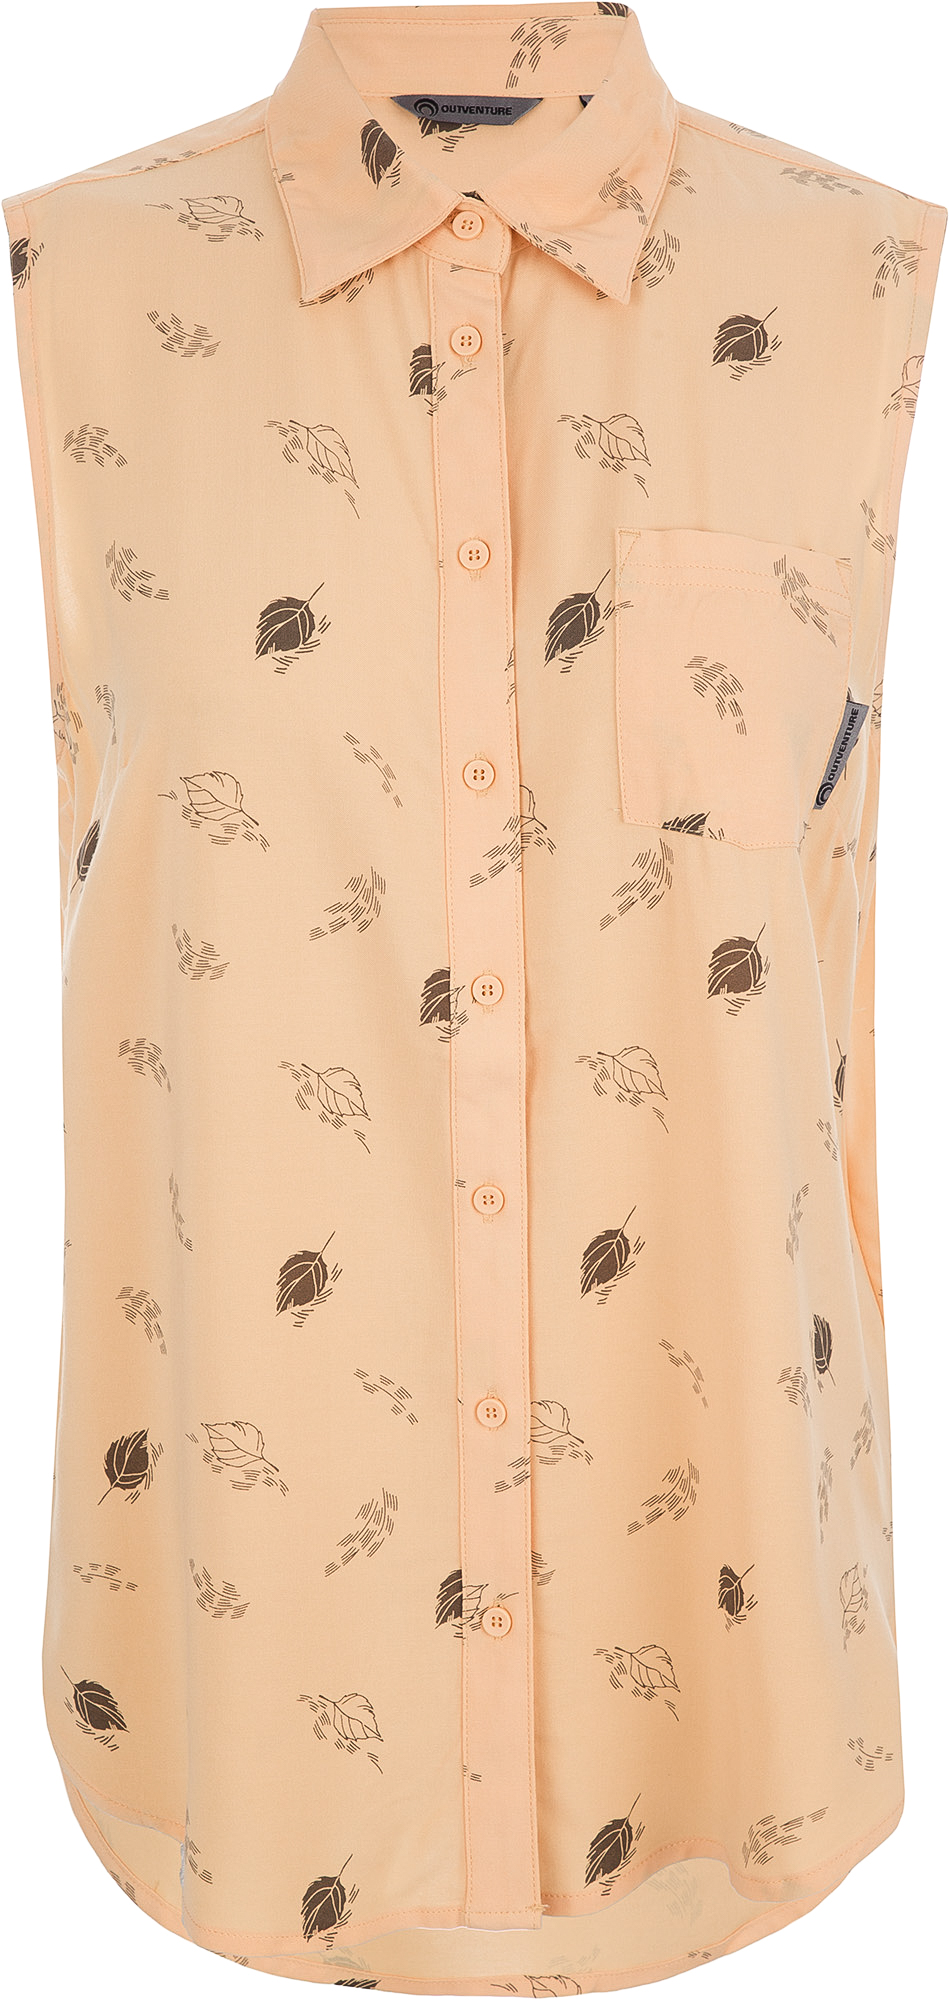 Outventure Рубашка без рукавов женская Outventure, размер 54